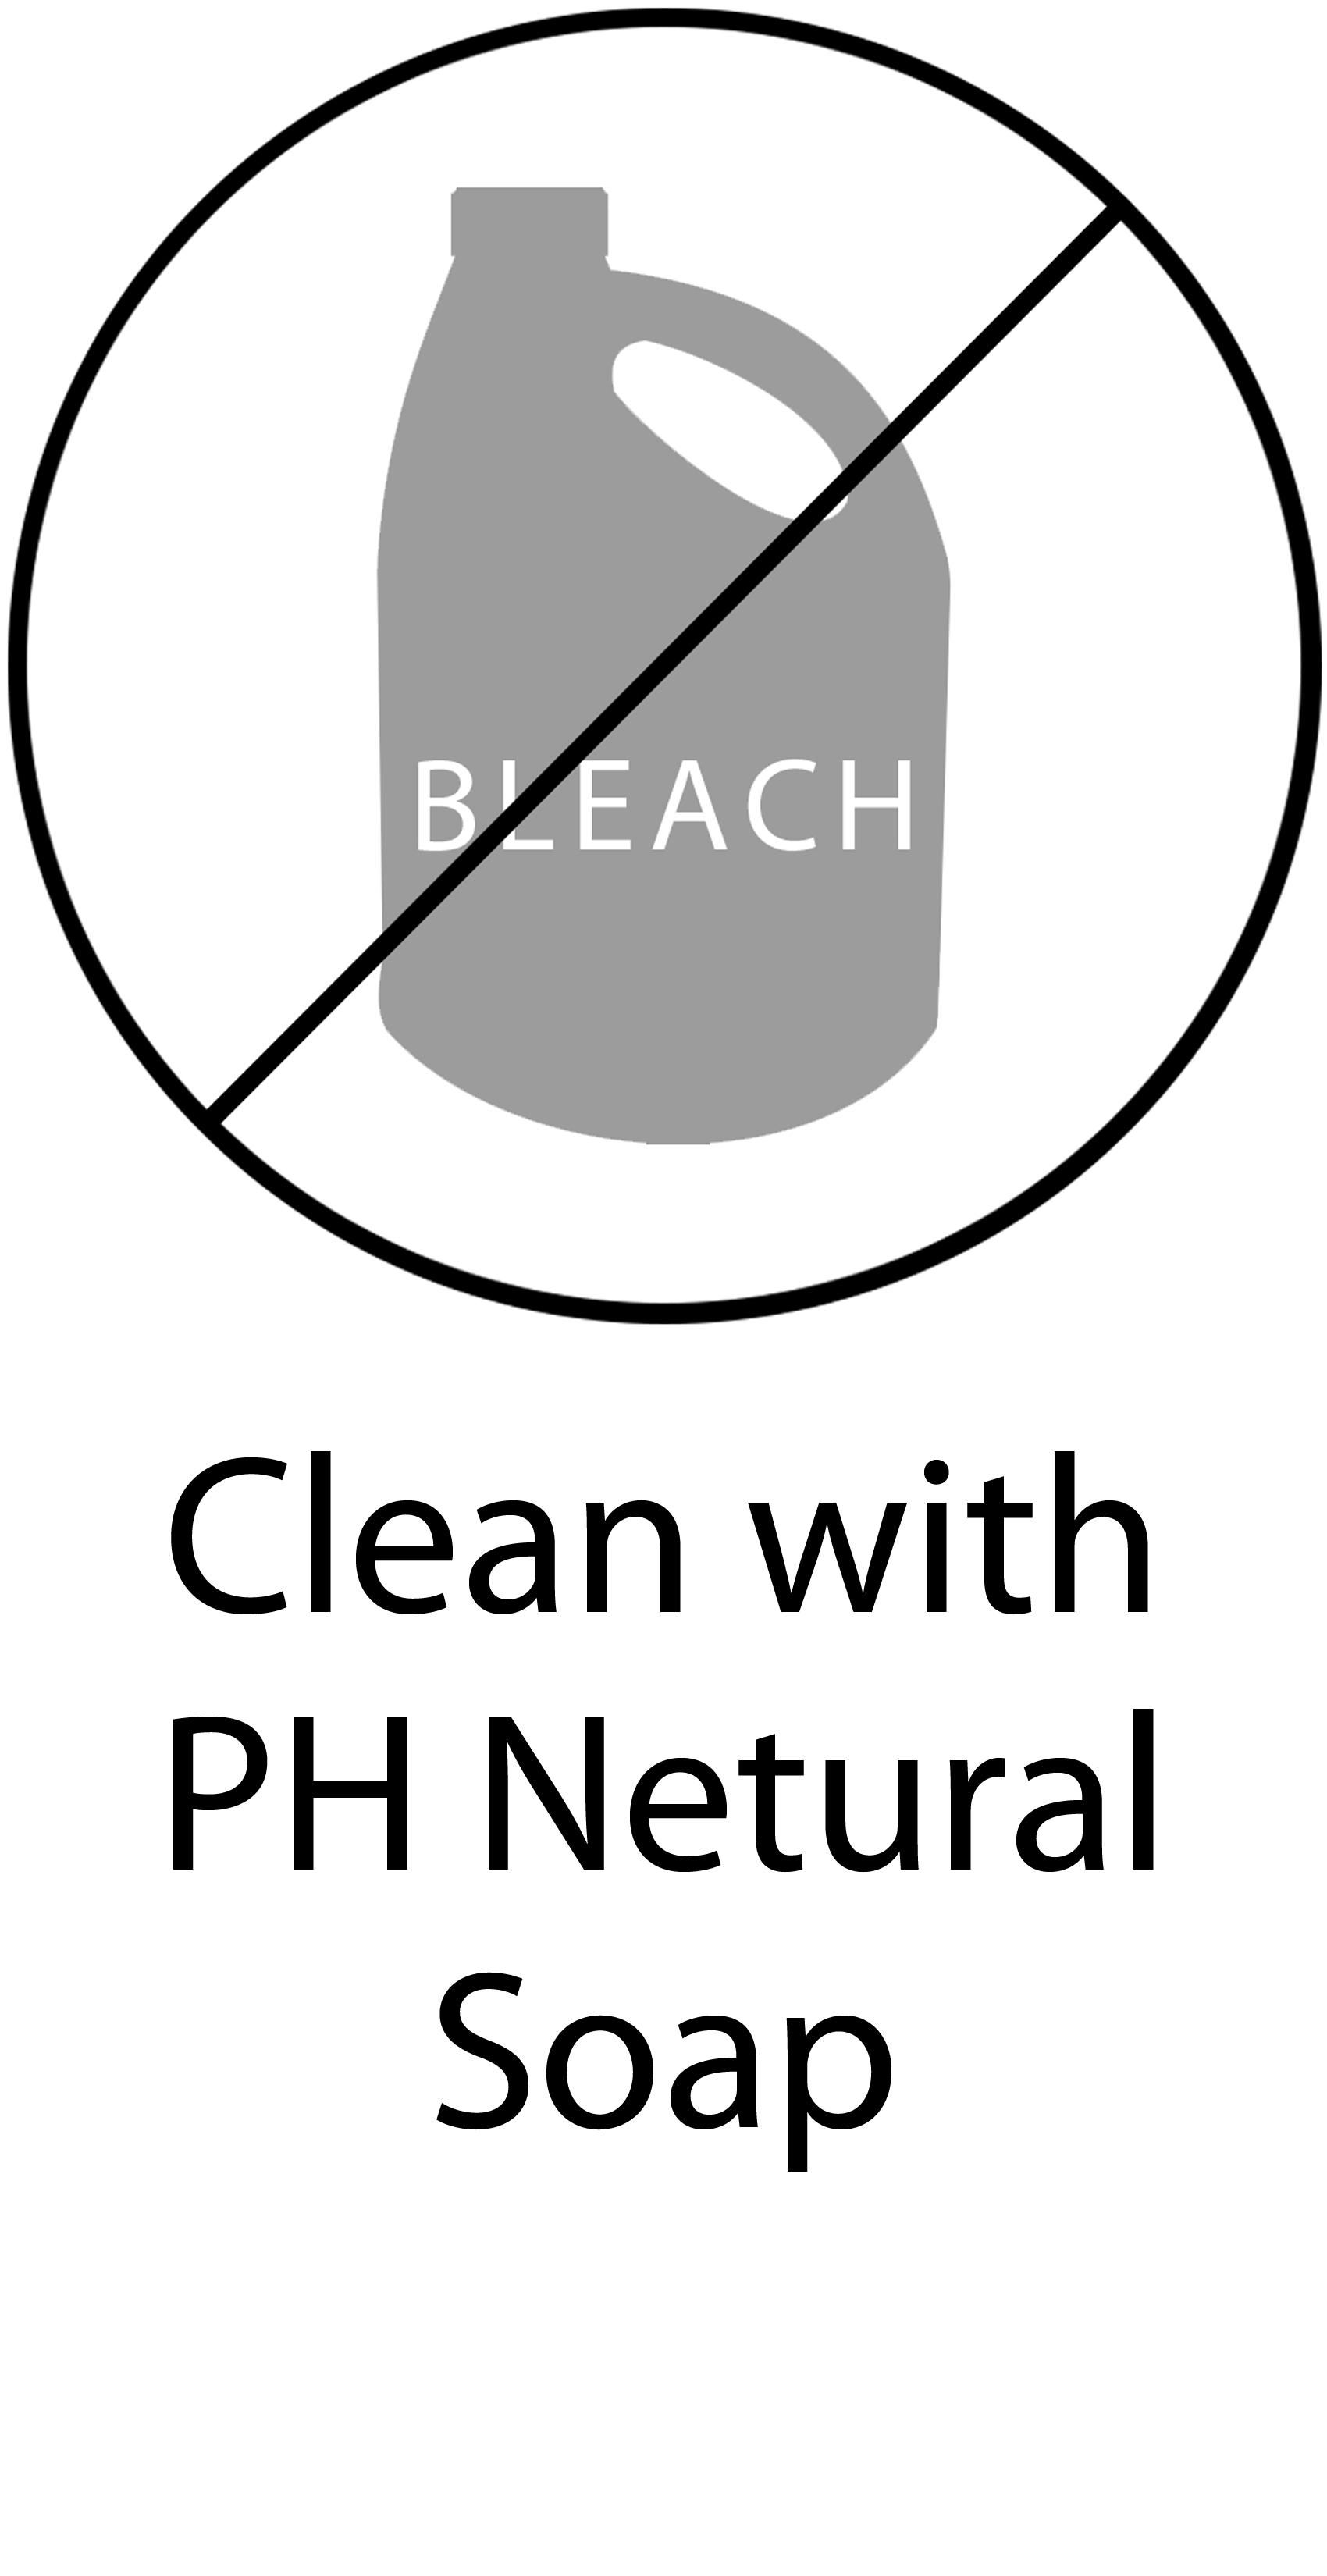 Clean with PH Neutral Soap.jpg